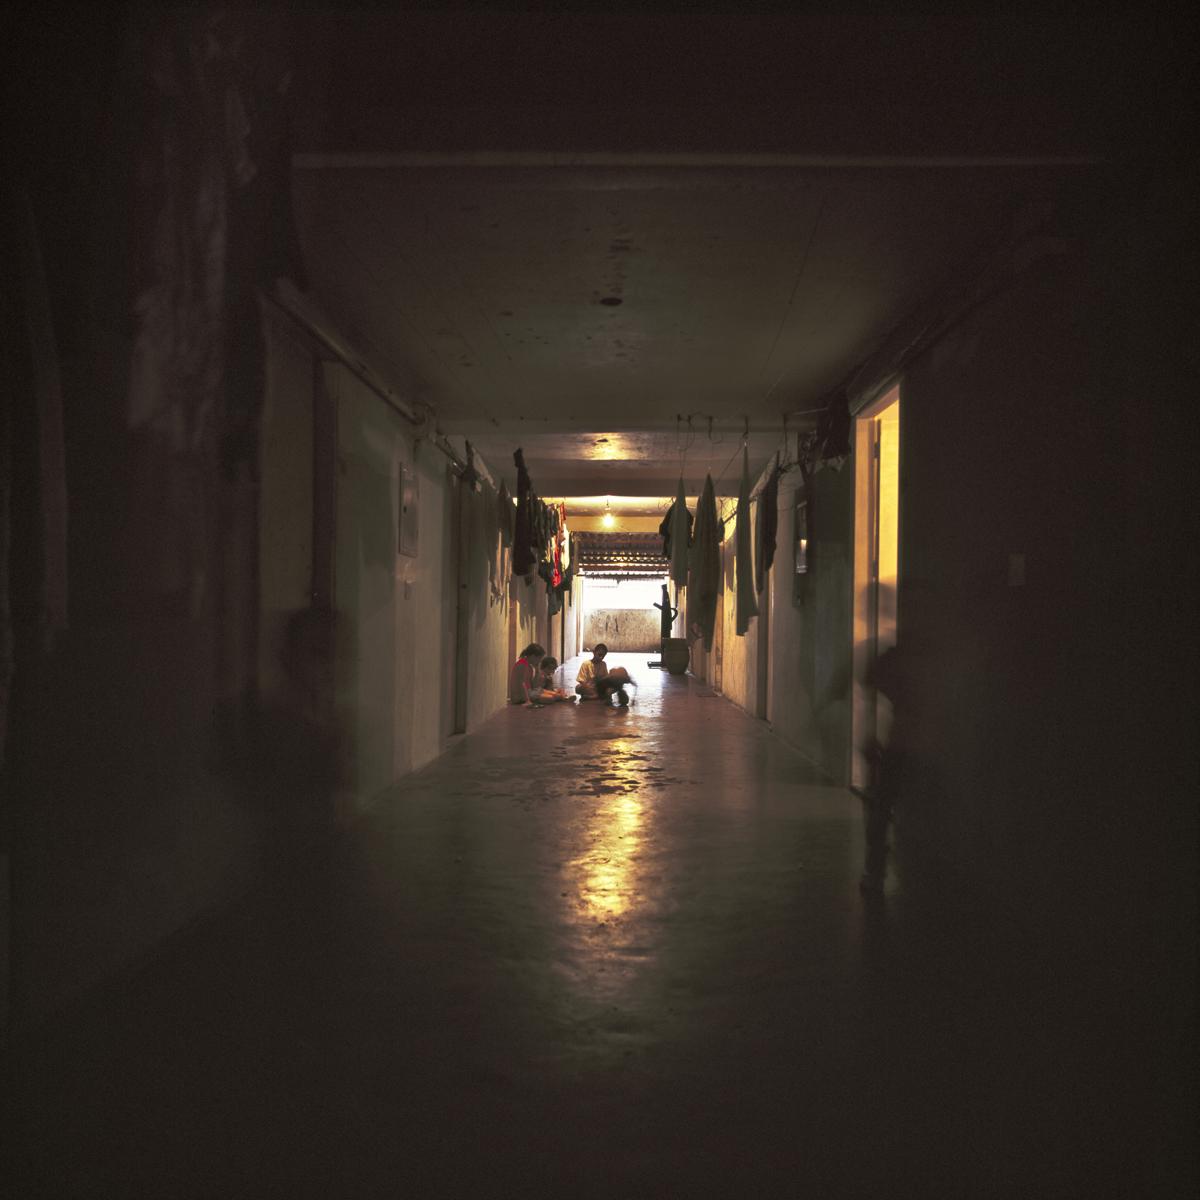 SP_Parisopolis_hallway3_12x12.jpg